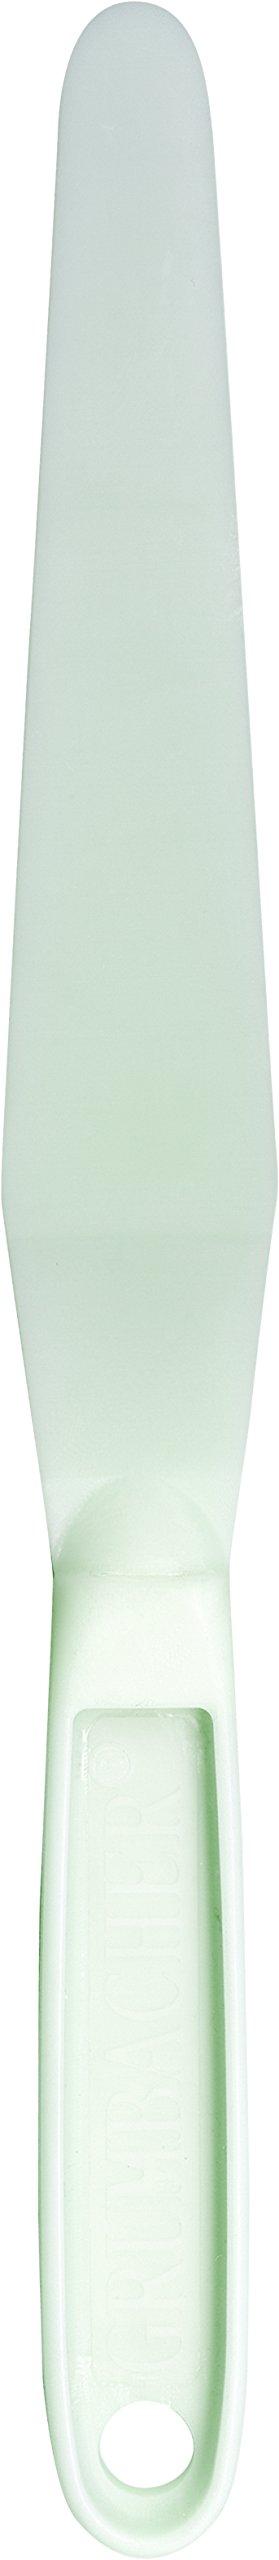 Grumbacher Spatula Painting Knife, 10 Inches, Plastic (PKS6D)